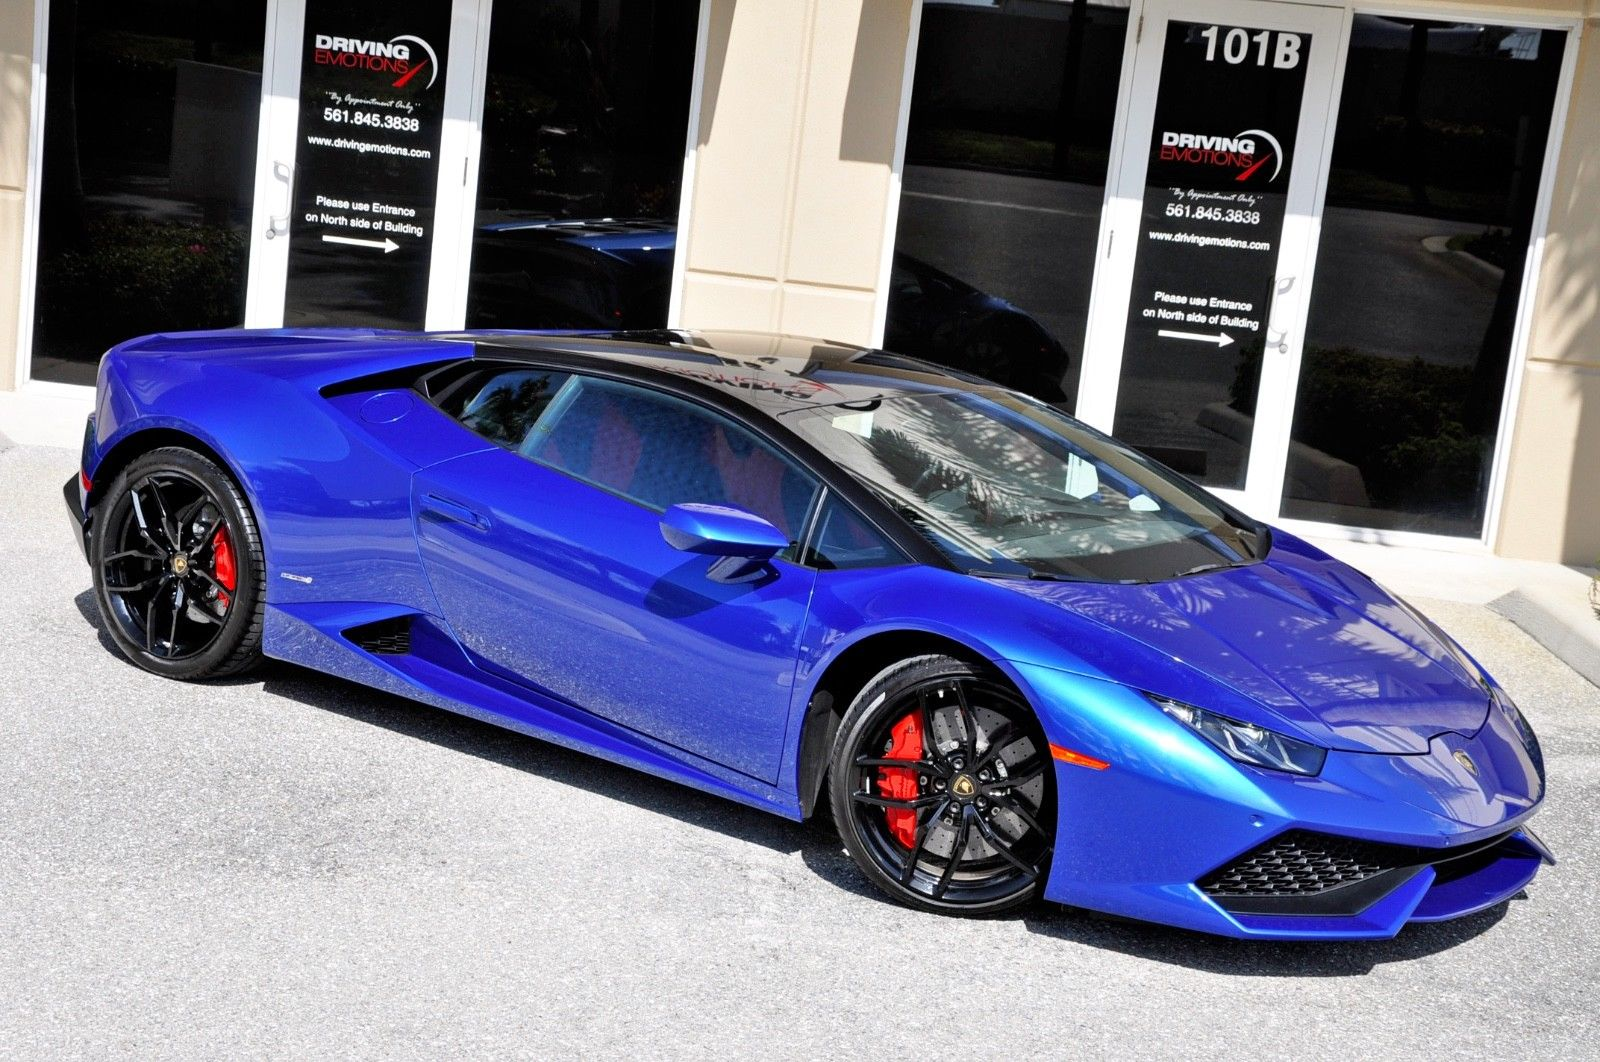 Used Honda Pilot For Sale >> Awesome 2015 Lamborghini Huracan LP610-4 2015 LAMBORGHINI ...